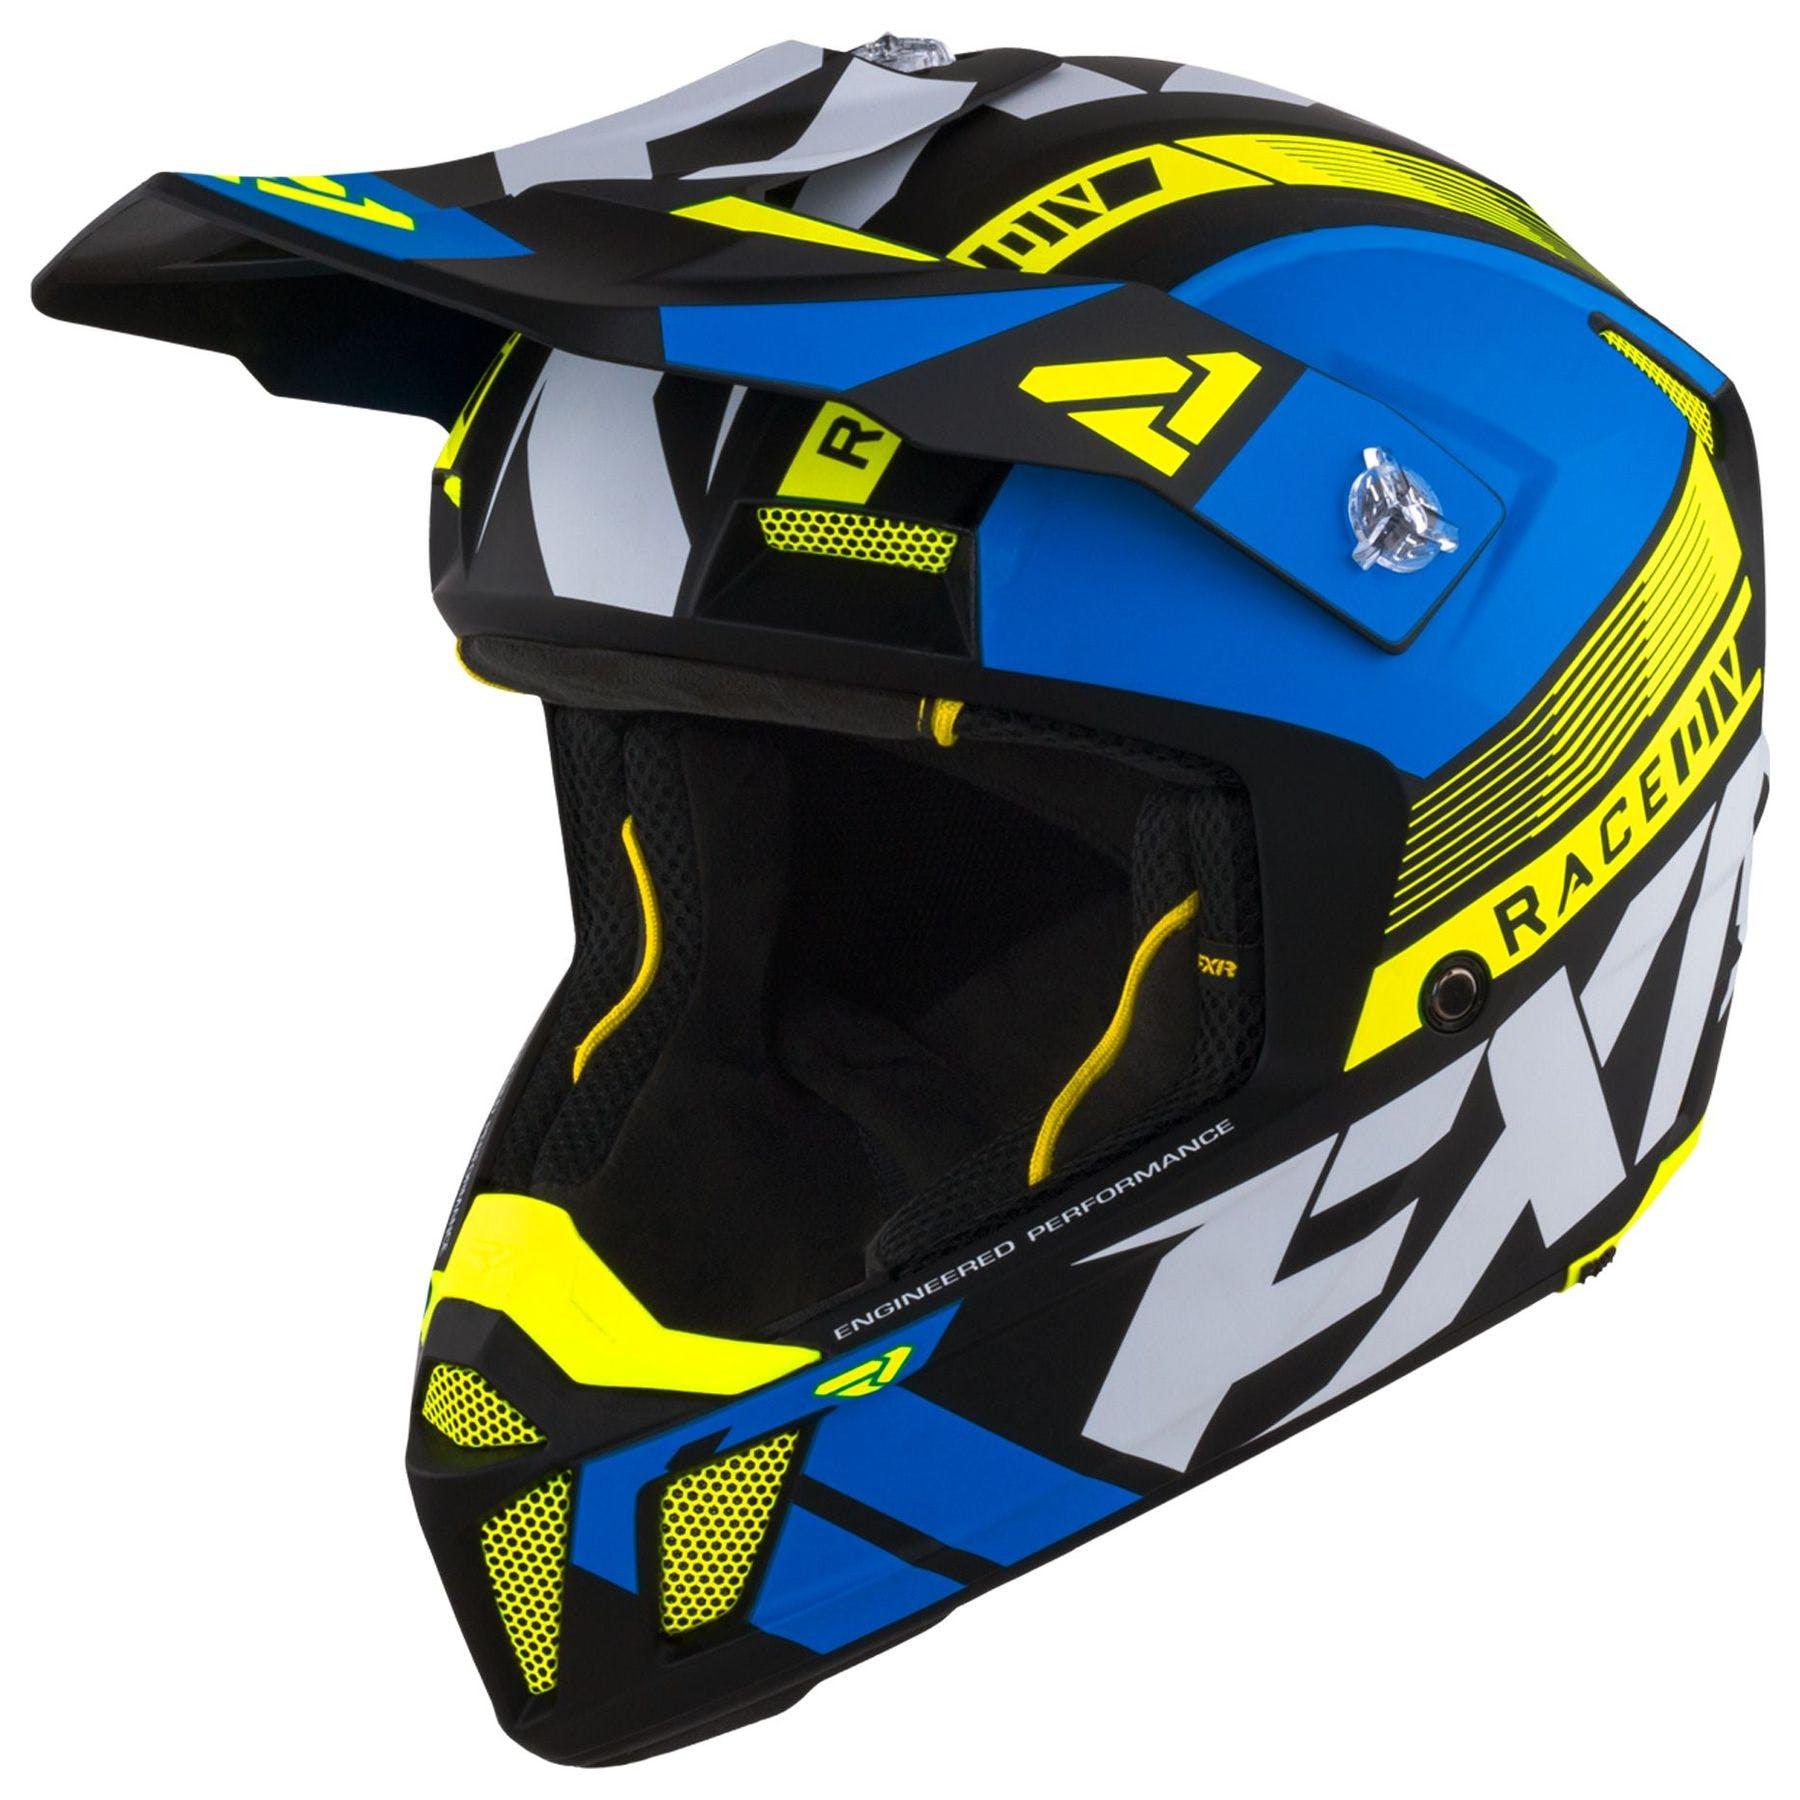 XS Qtech Childrens KIDS MOTOCROSS MX Style Helmet BMX Quad Bike Spectre by Yellow